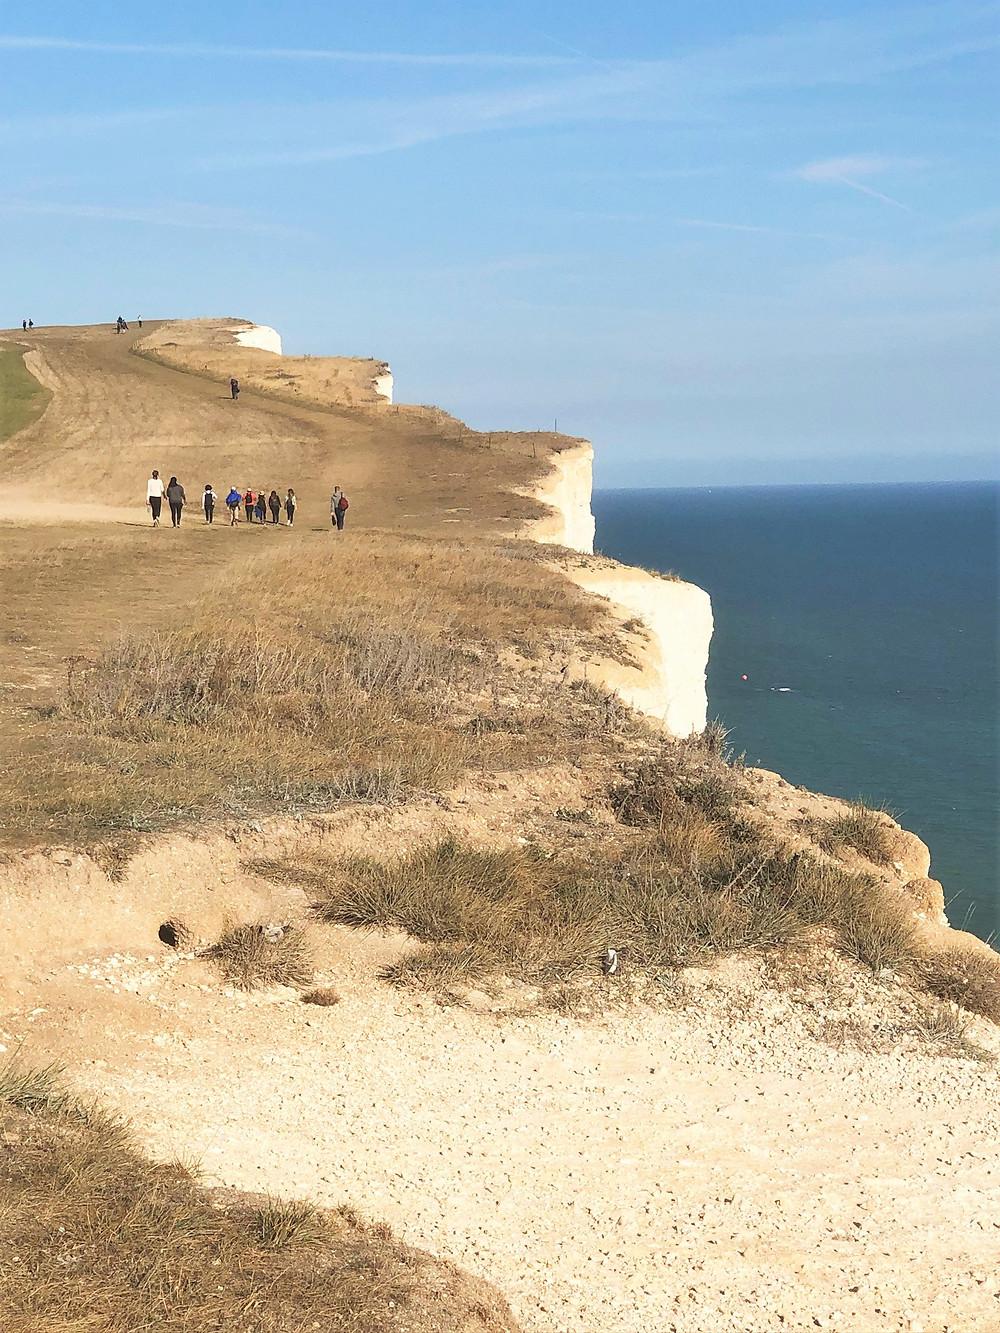 Beachy Head cliff walk along the England coast